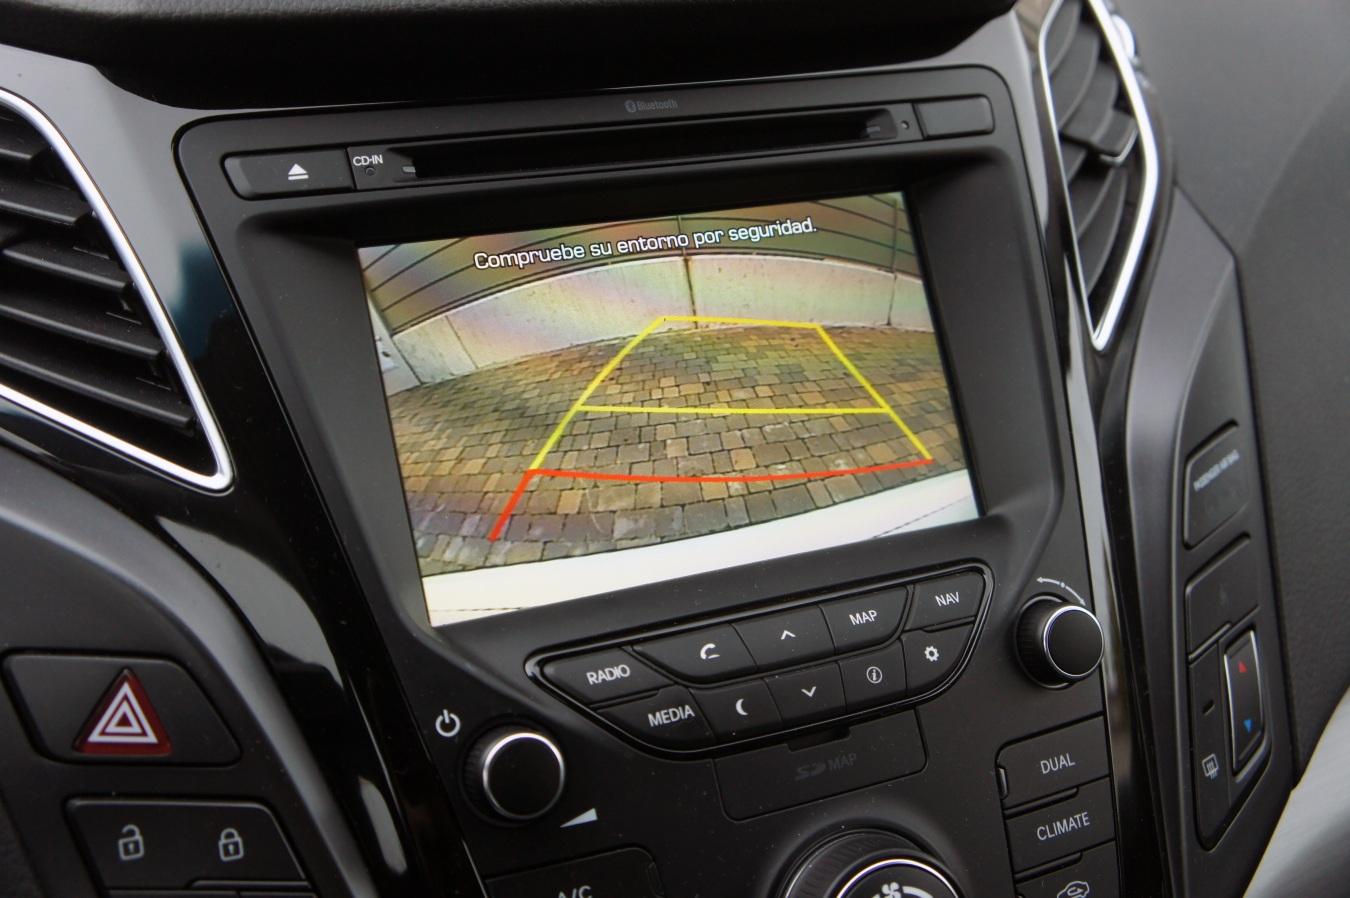 Prueba-Hyundai-i4045